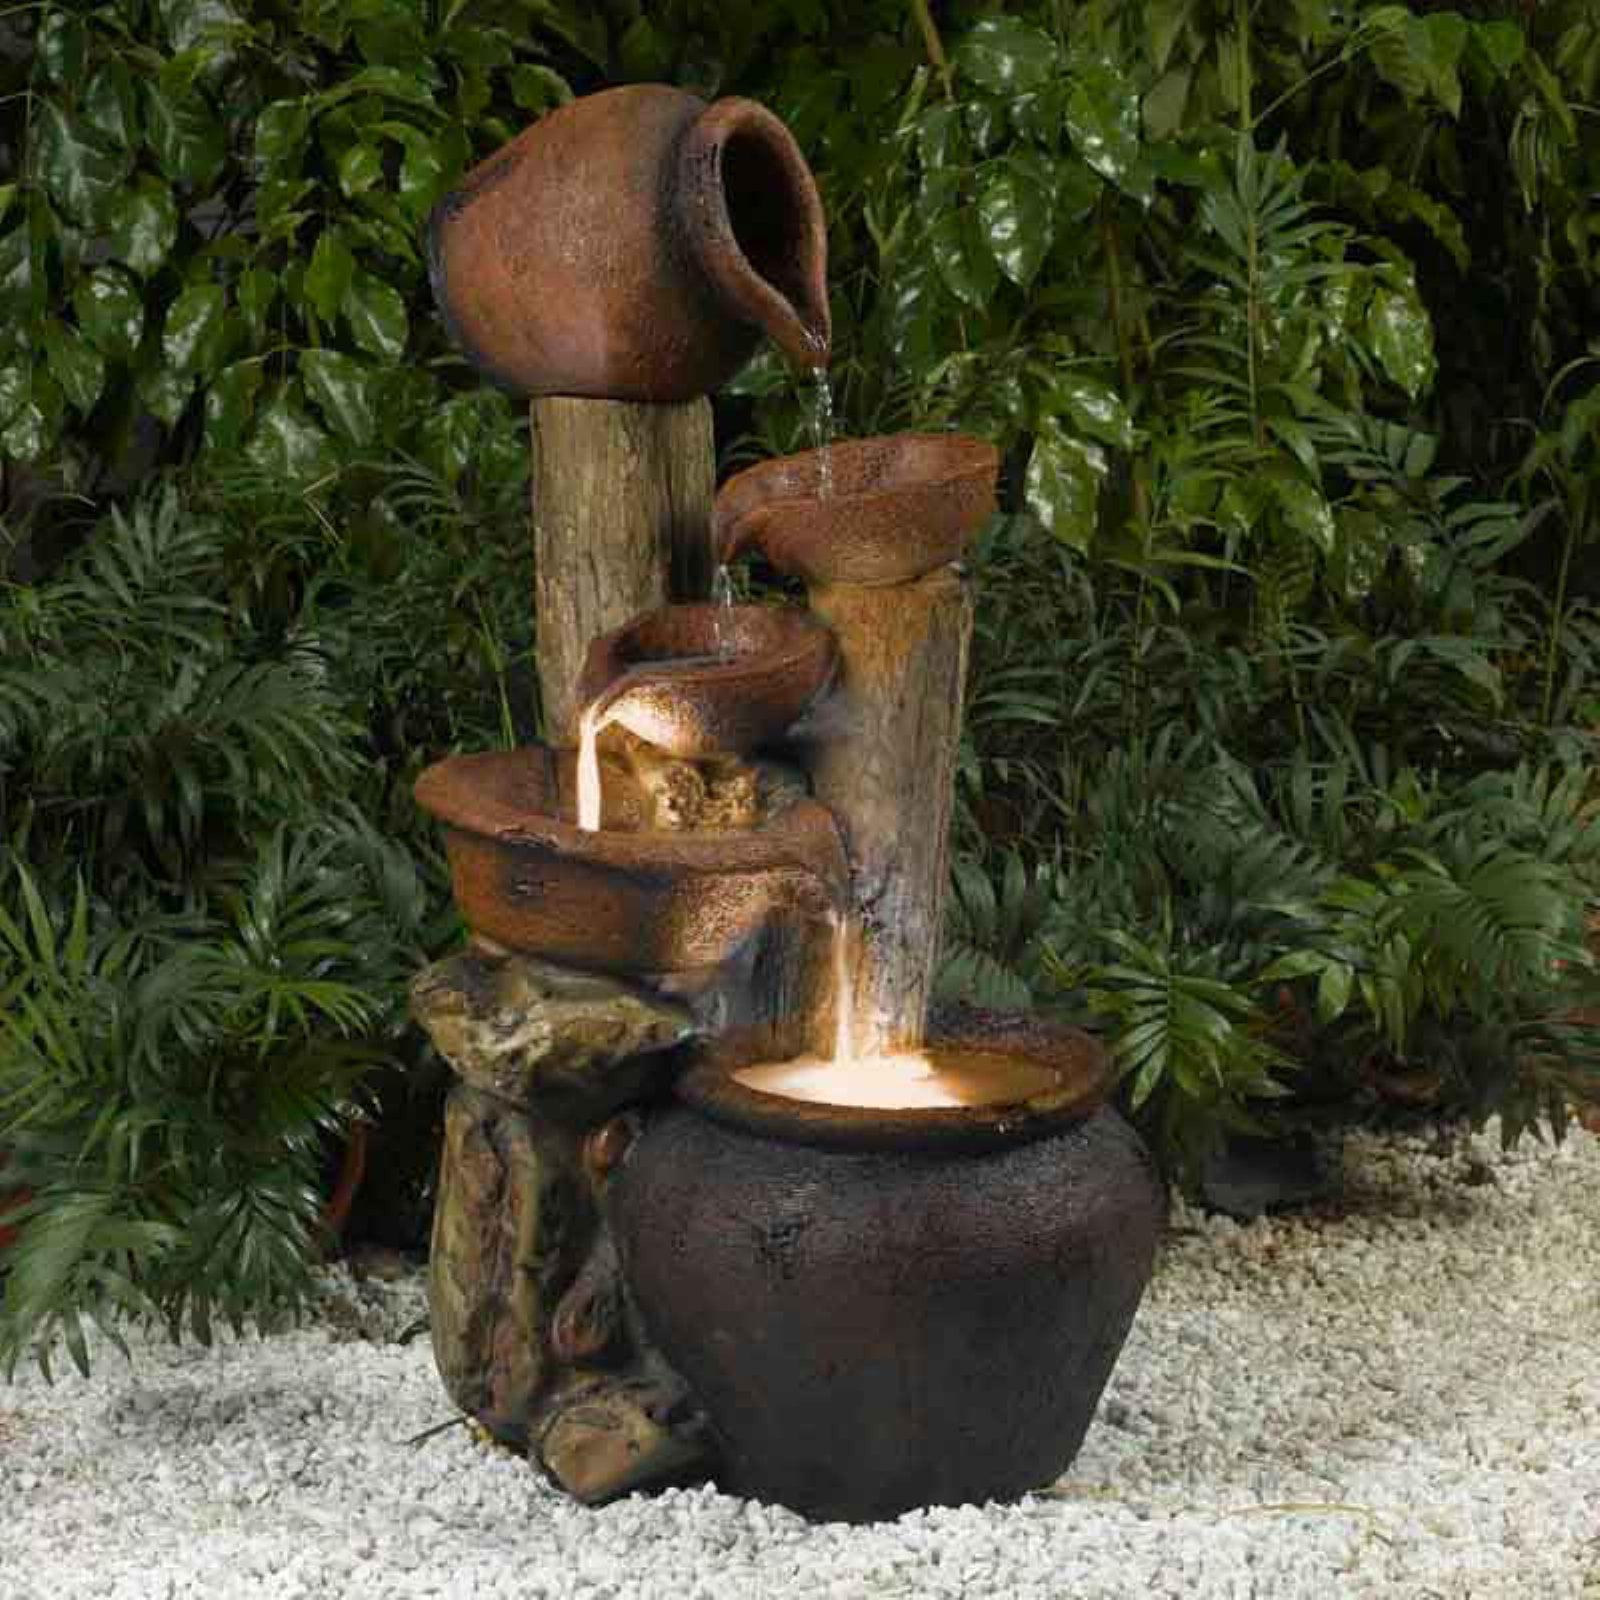 Jeco Pentole Pot Indoor/Outdoor Fountain with Illumination